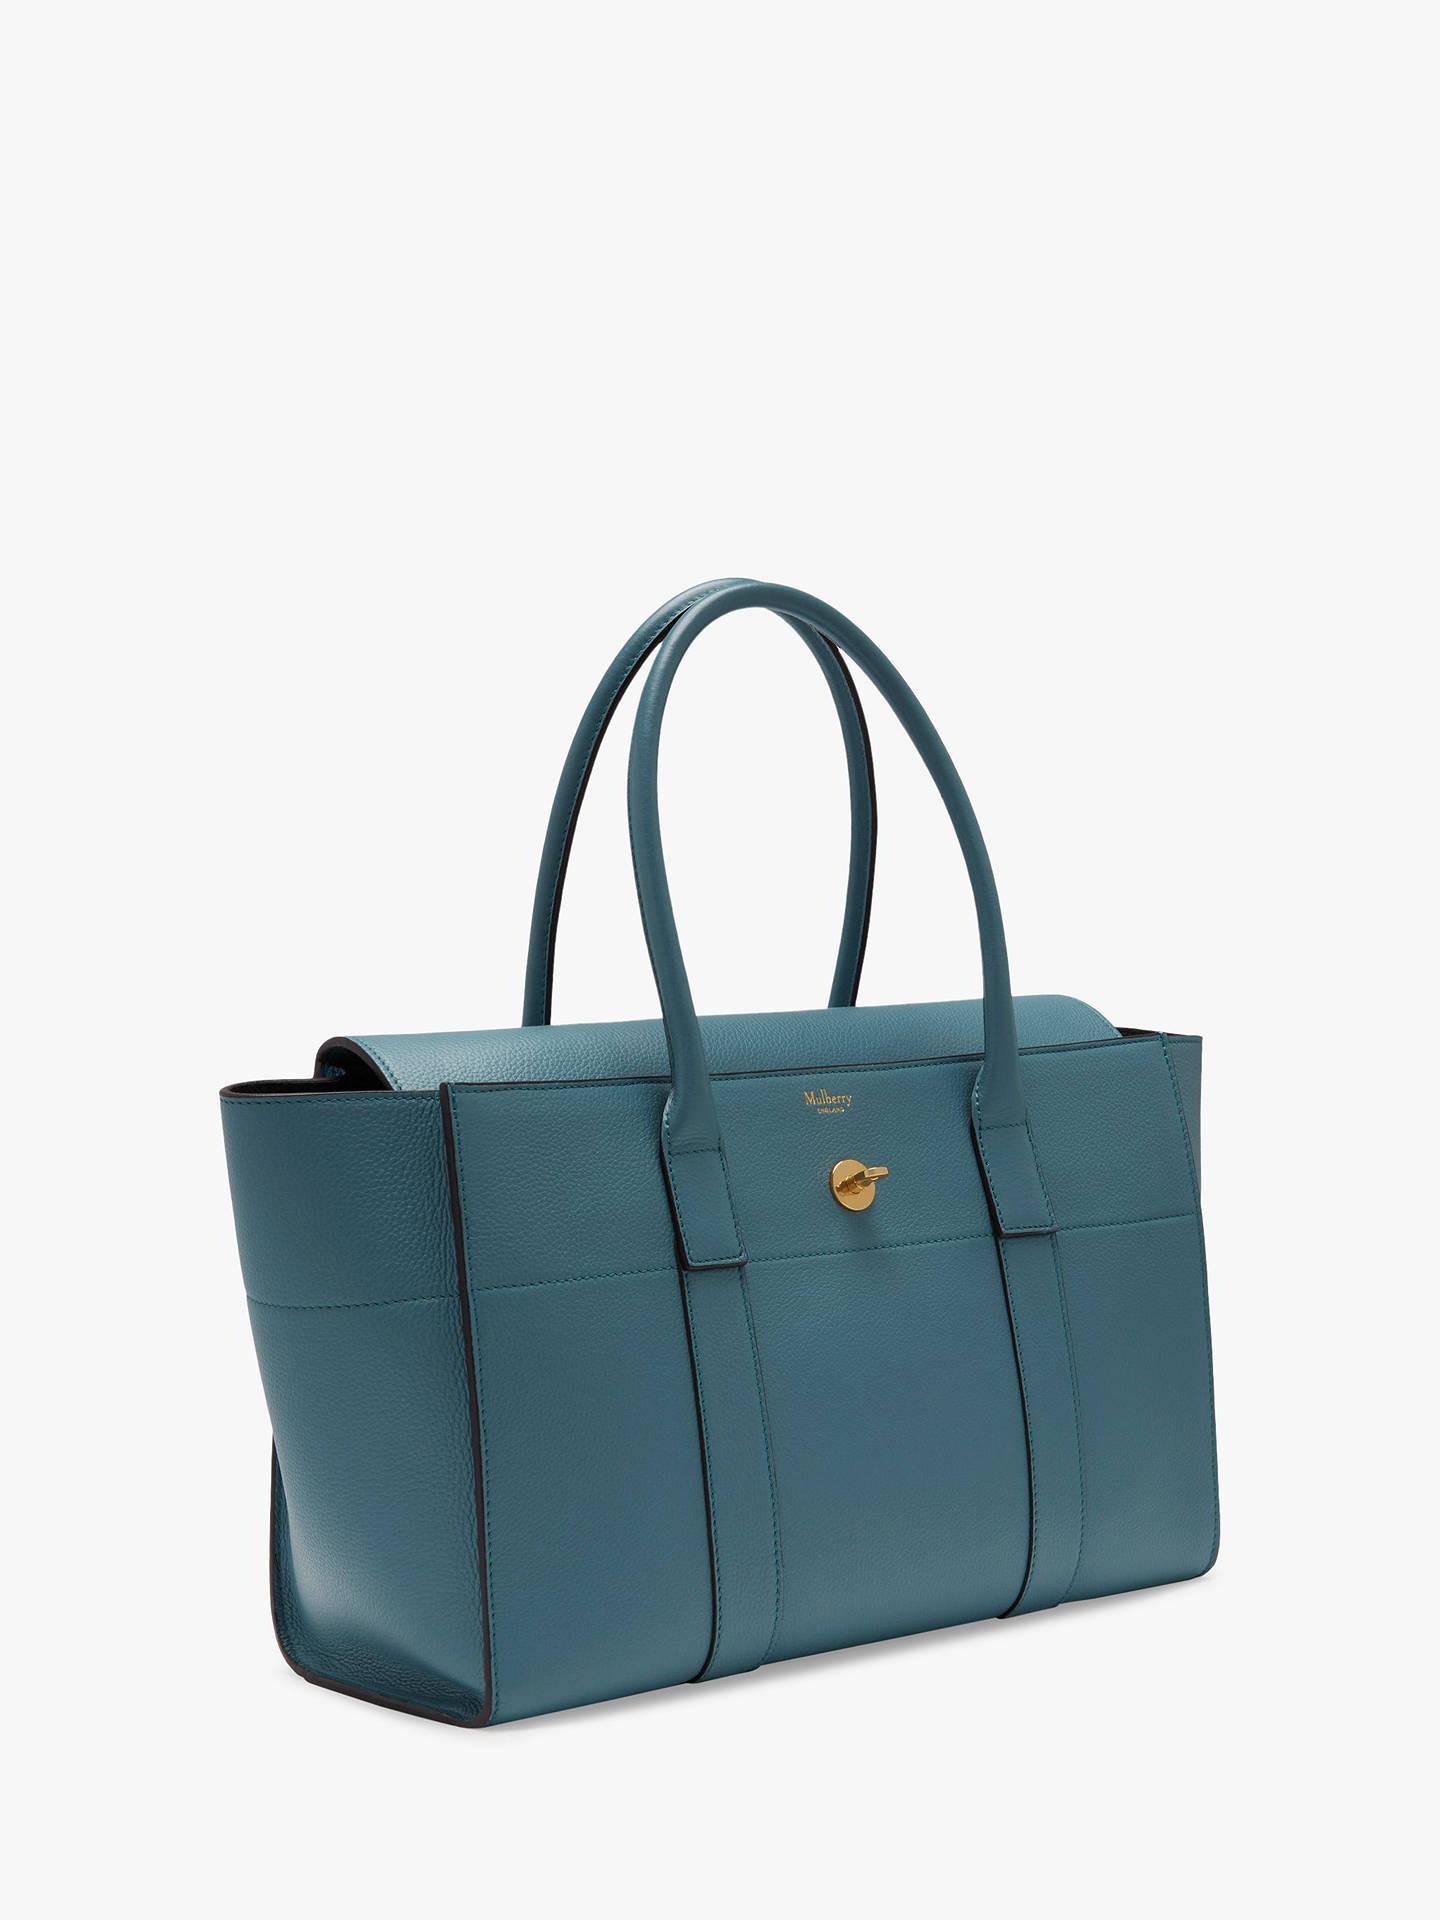 e9311f706295 Mulberry Bayswater New Small Classic Grain Leather Handbag at John ...